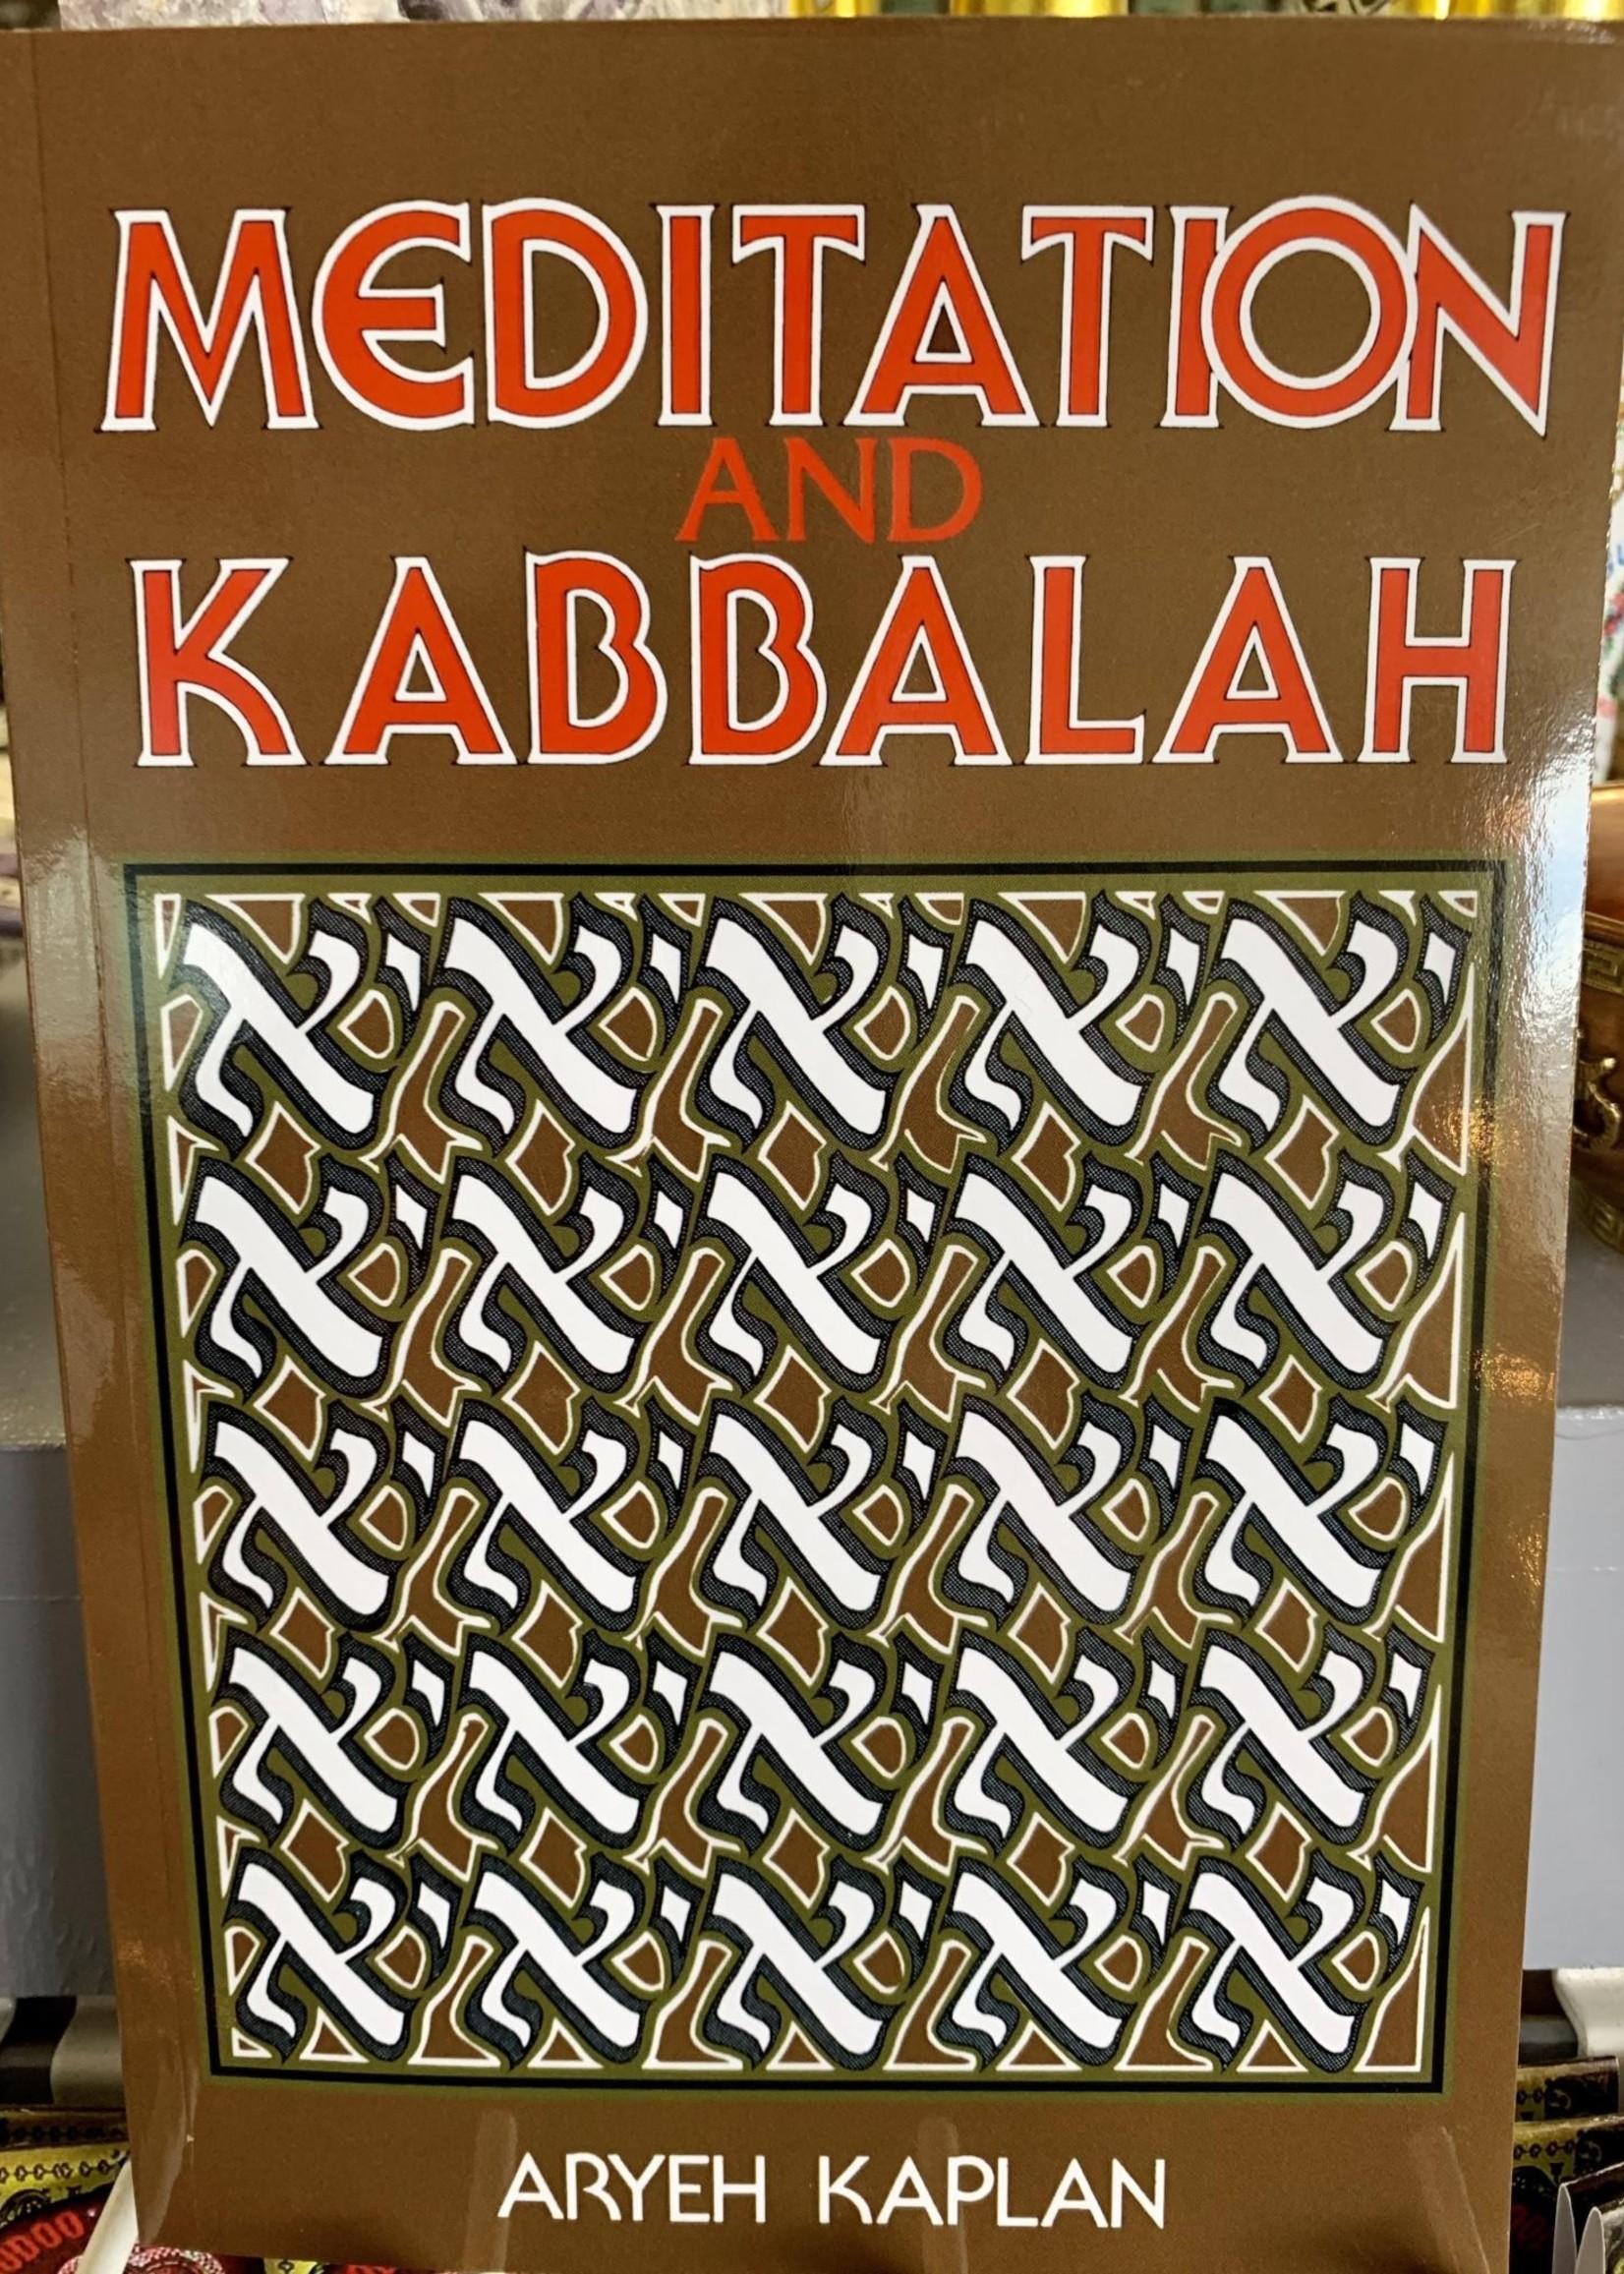 Meditation and Kabbalah - Aryeh Kaplan